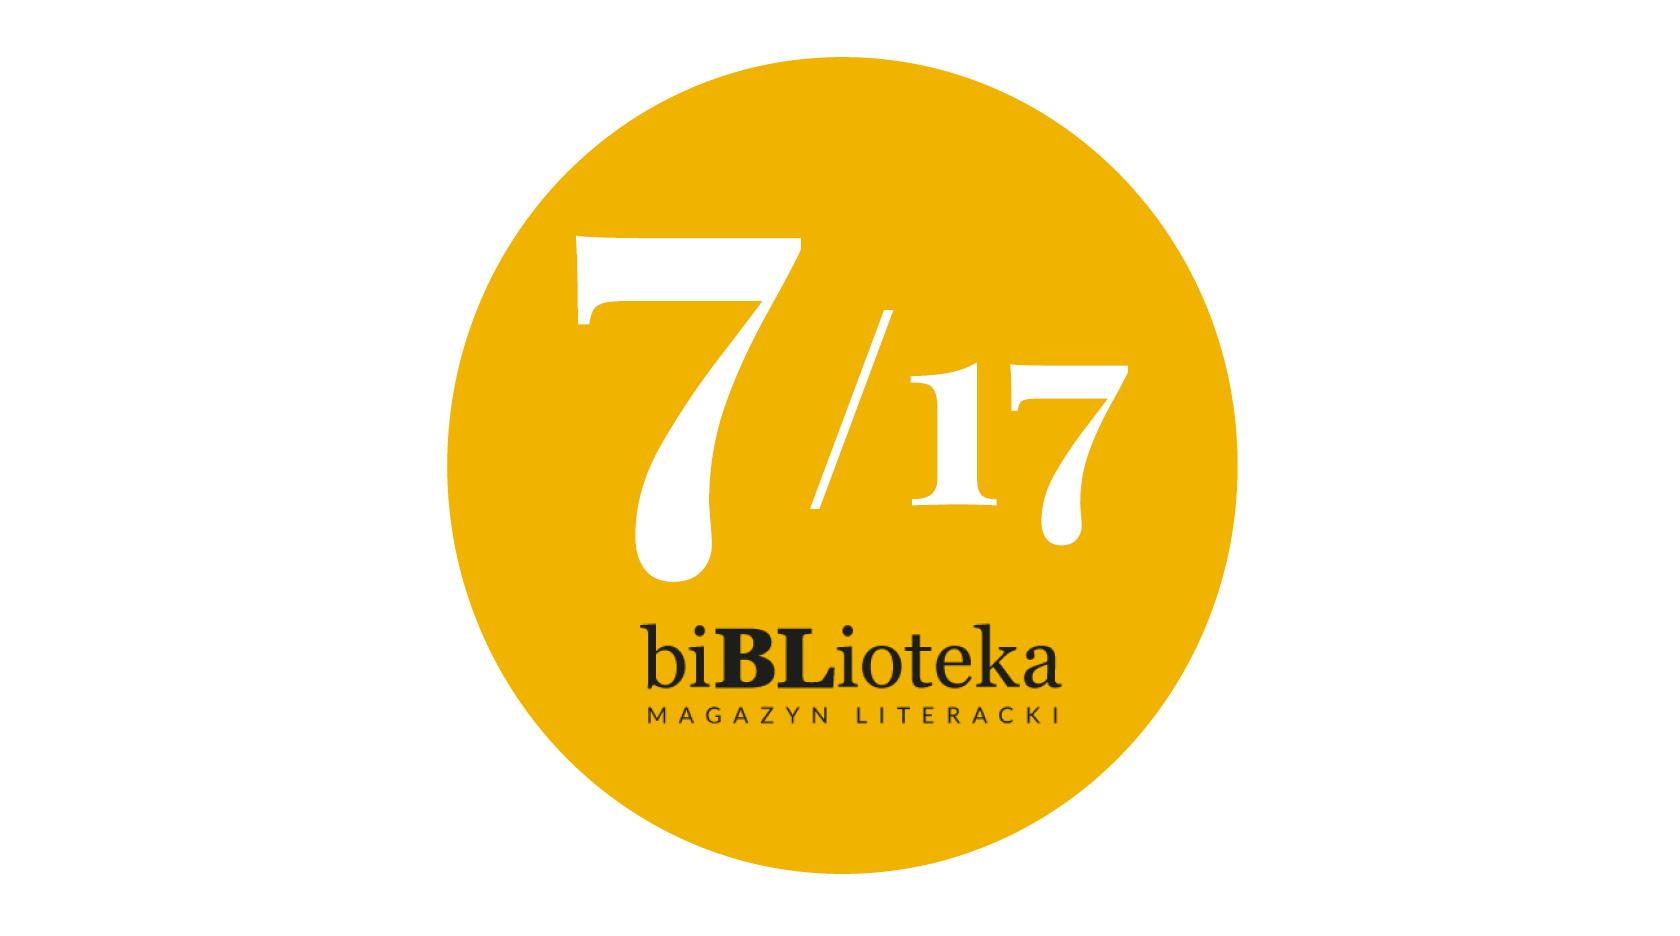 BL Img 2017.04.04 biBLioteka nr 20177_www